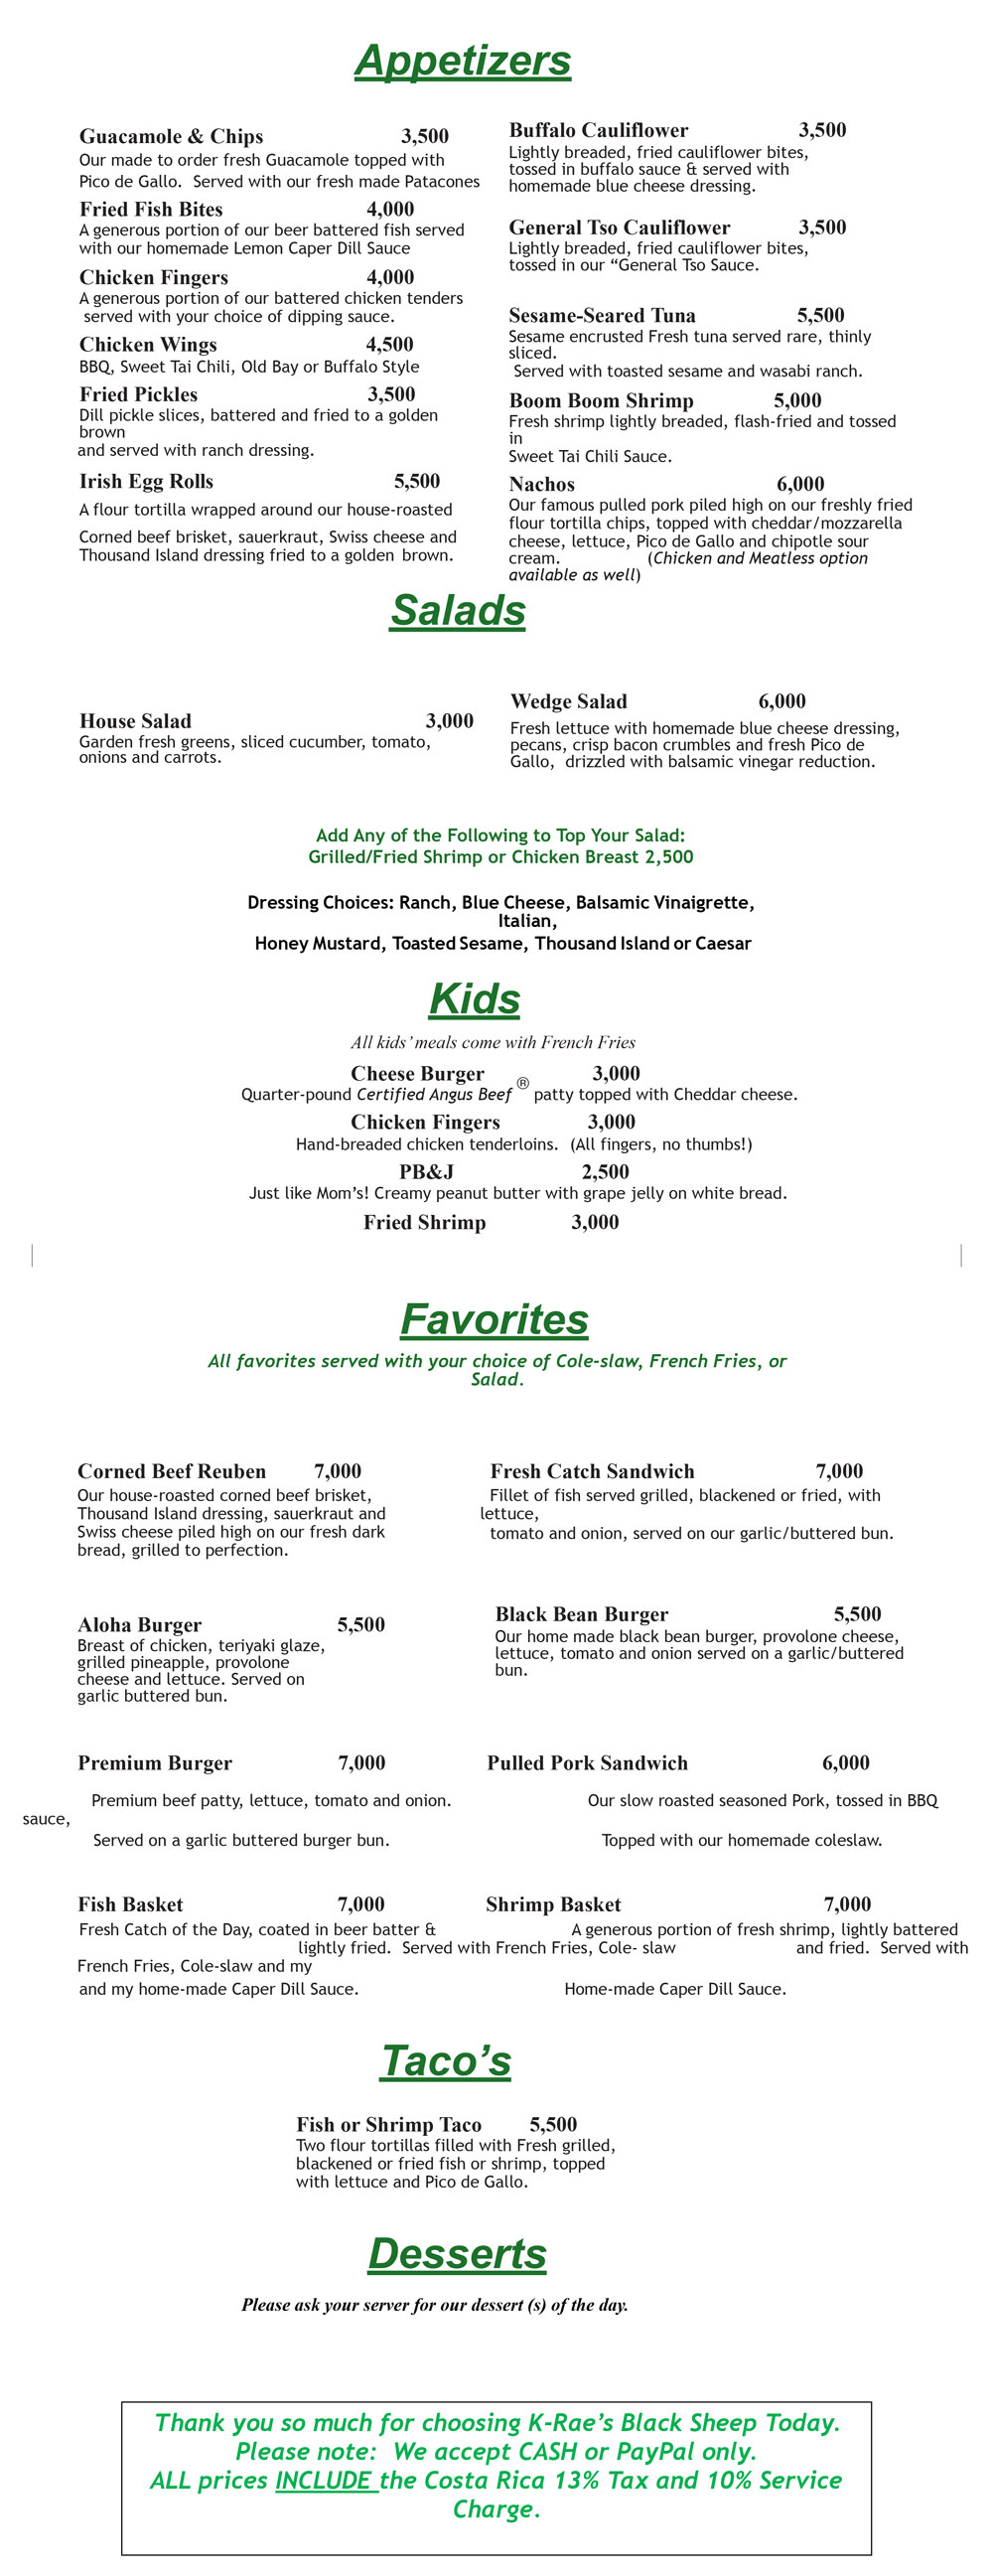 KRAES-nosara-menu-costa-rica.jpg